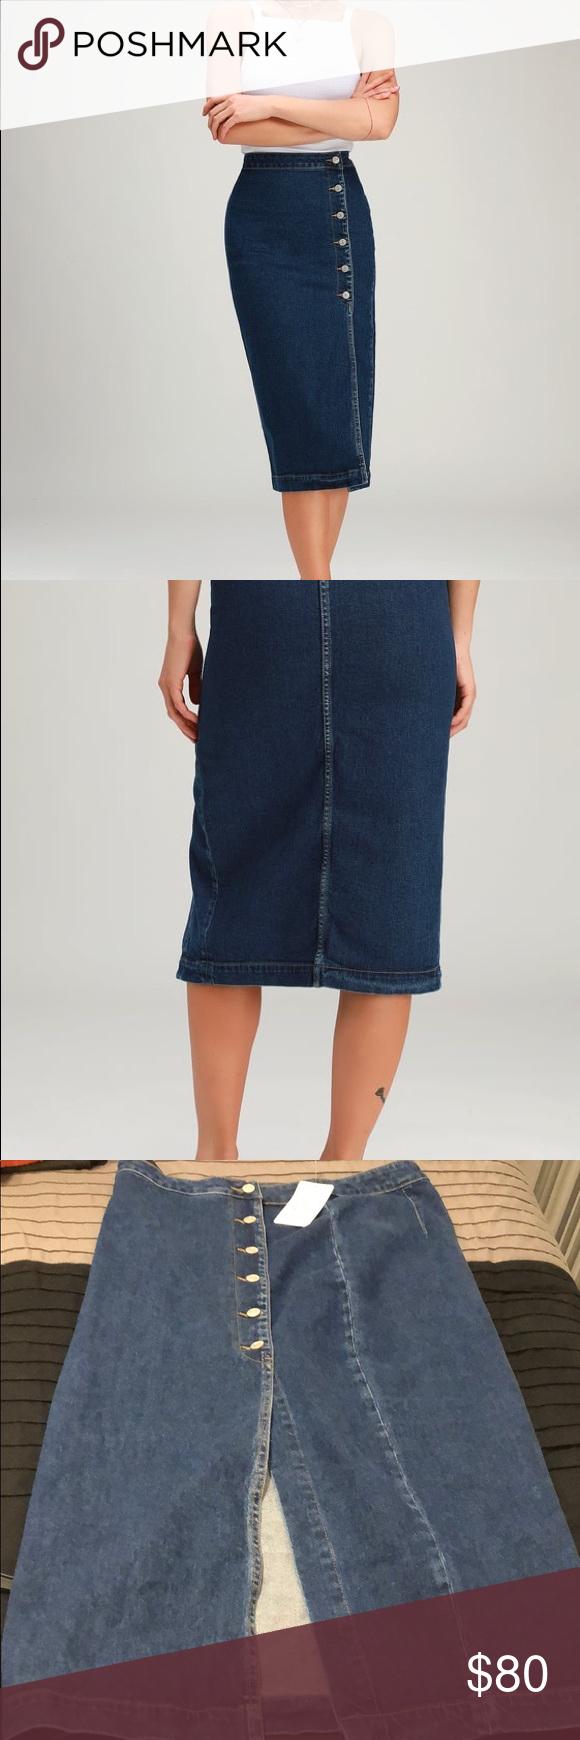 f16794102 JASMINE DARK WASH BUTTONED MIDI SKIRT Free People Jasmine Dark Wash  Buttoned Midi Skirt! This